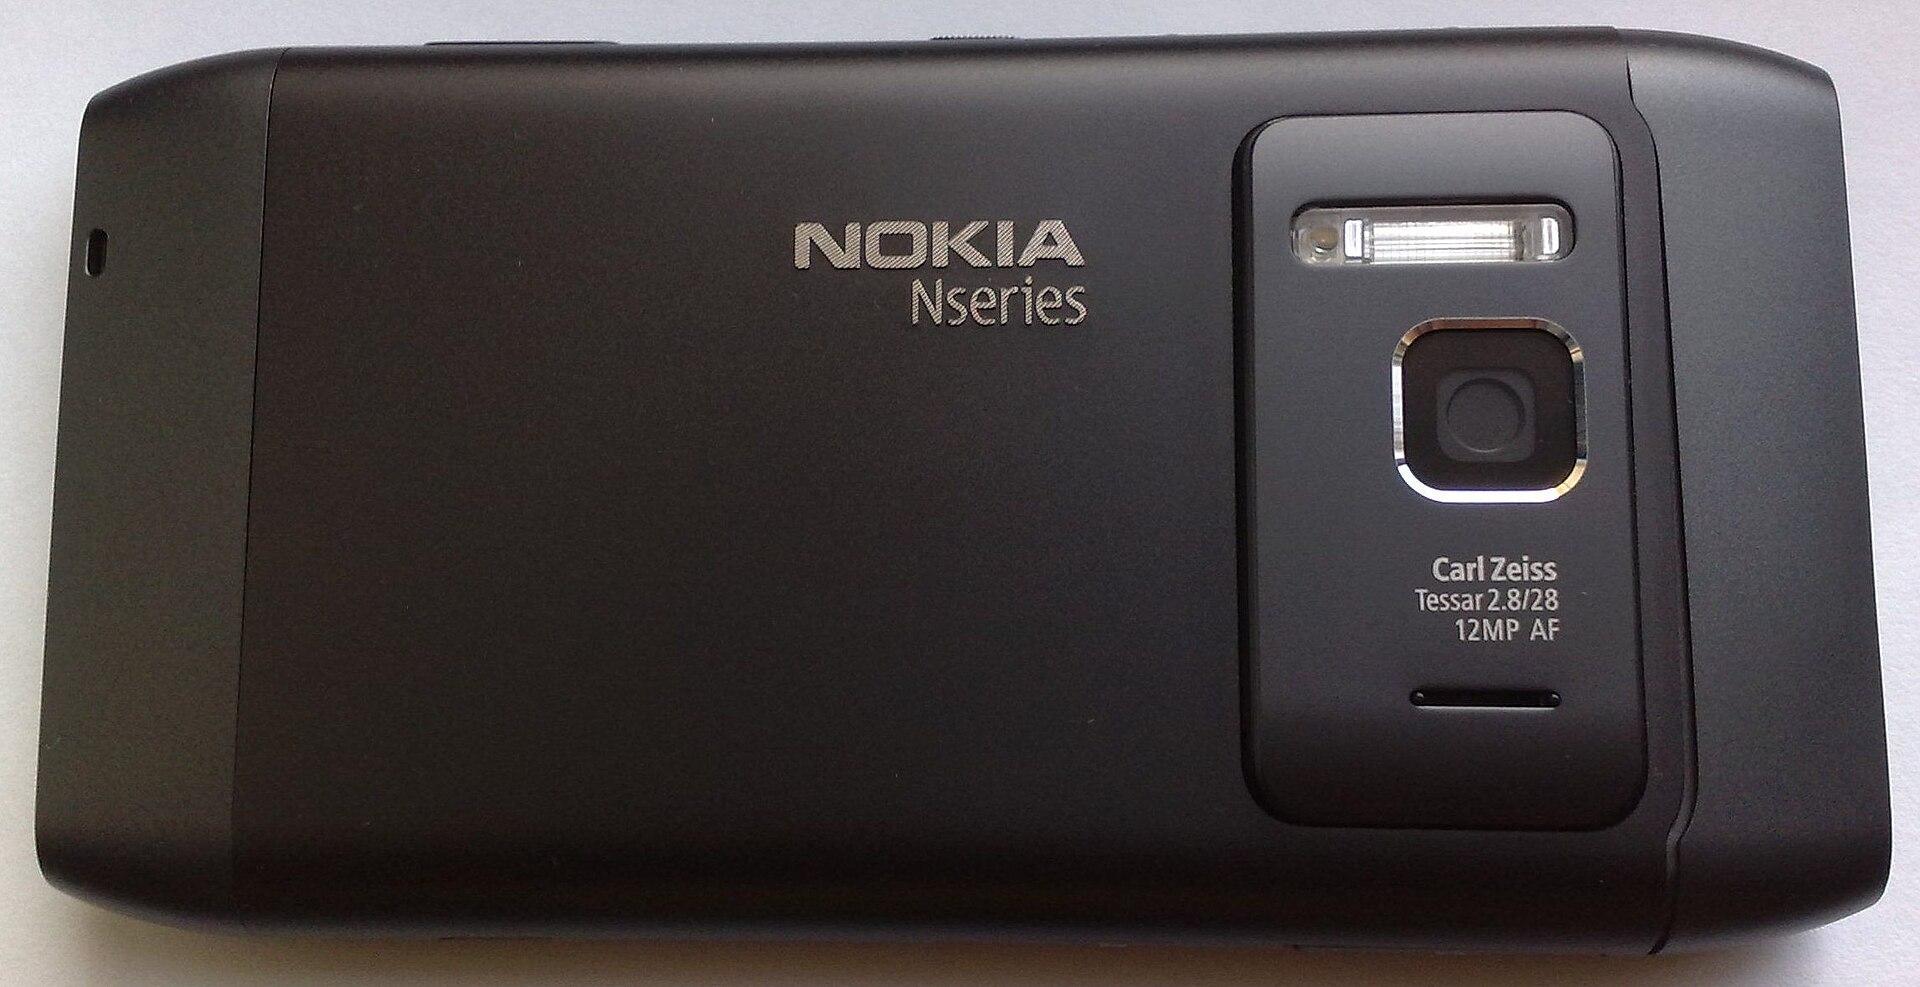 Nokia N8 - Wikipedia